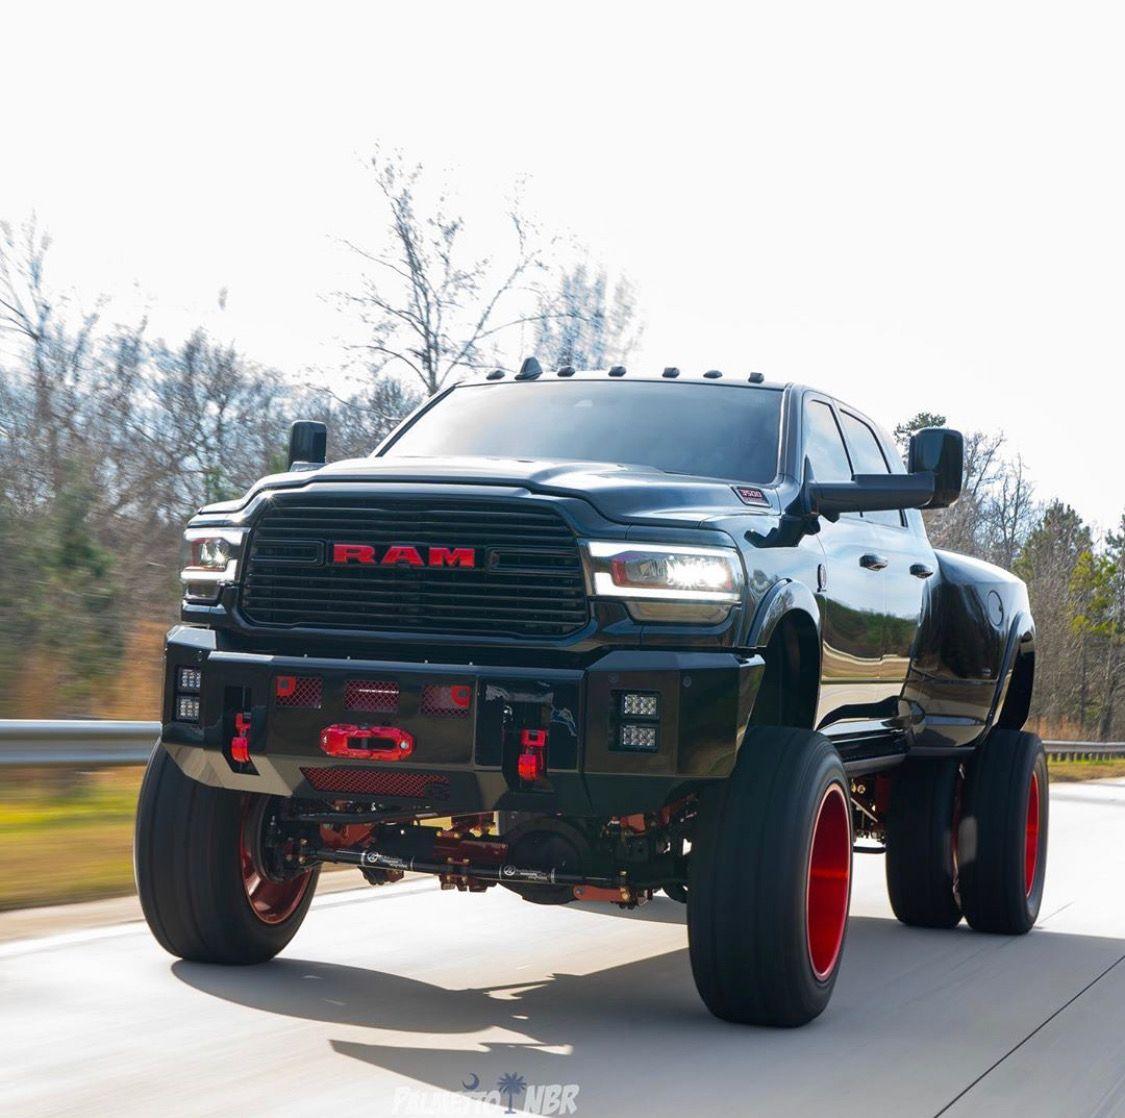 Lifted 2019 Ram 3500 Dually On 24 Wheels And 40 Tires Dodge Diesel Trucks Cummins Trucks Lifted Chevy Trucks